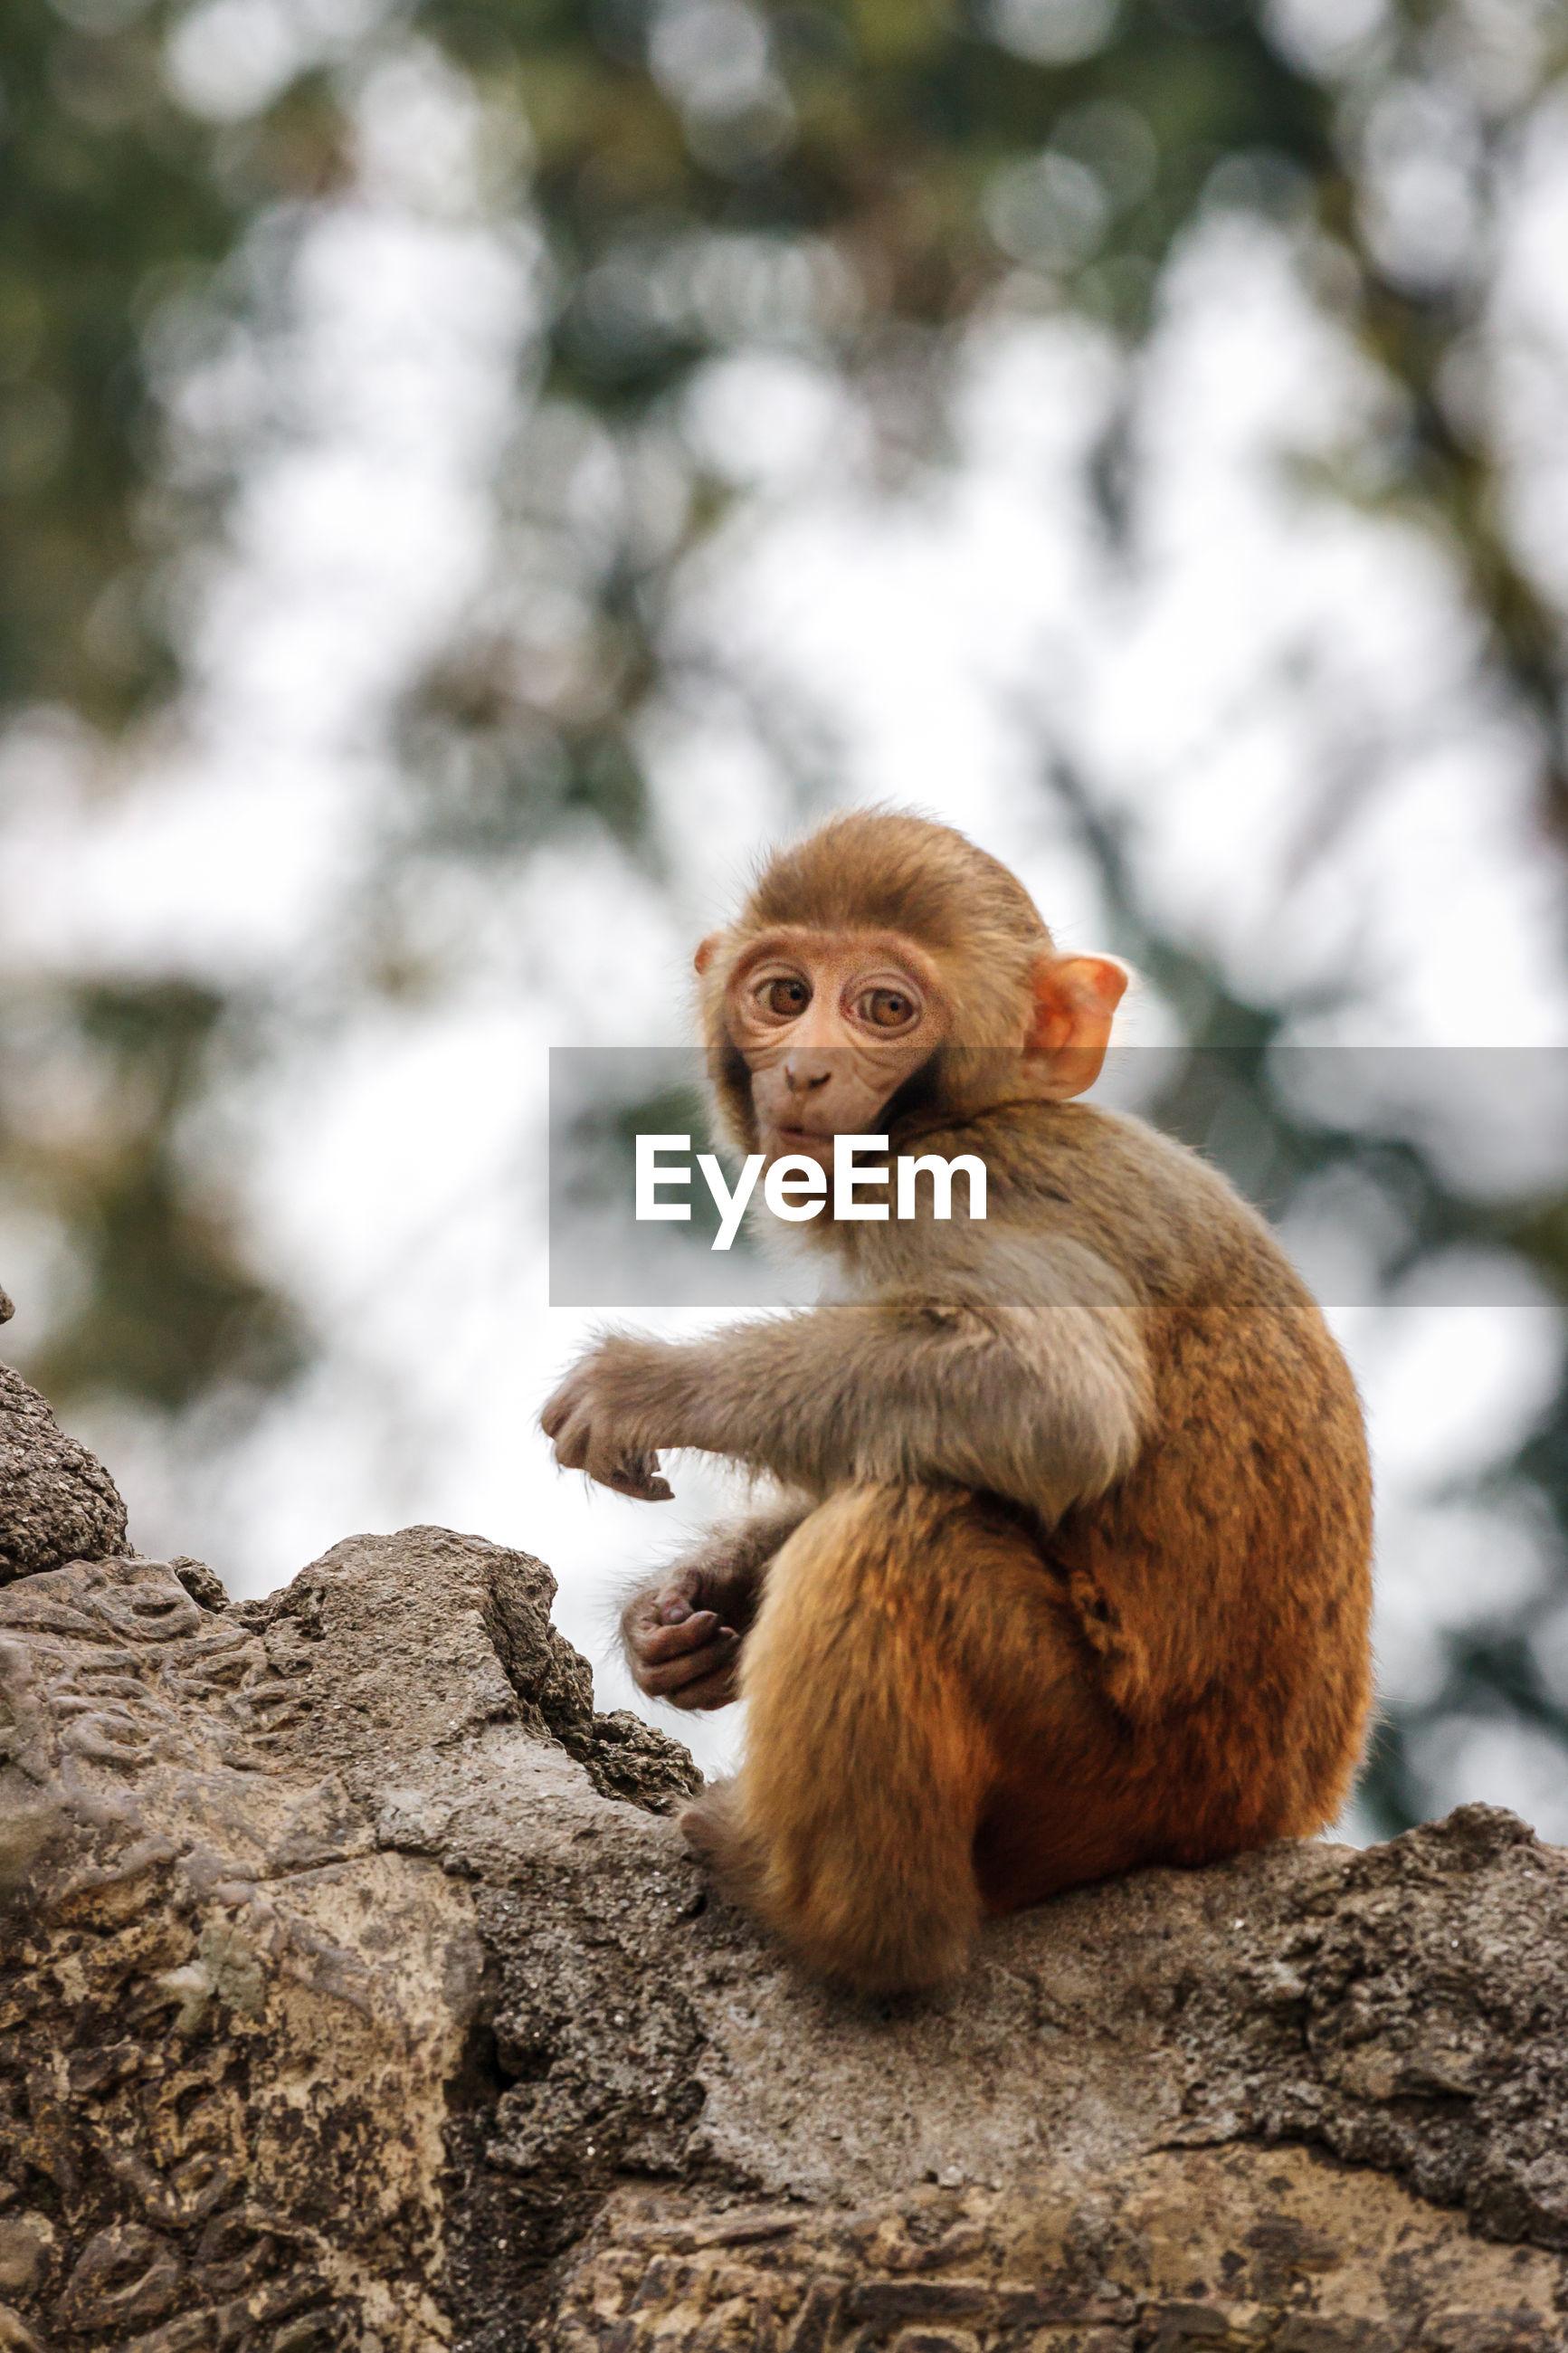 Close-up of monkey sitting carved rocks